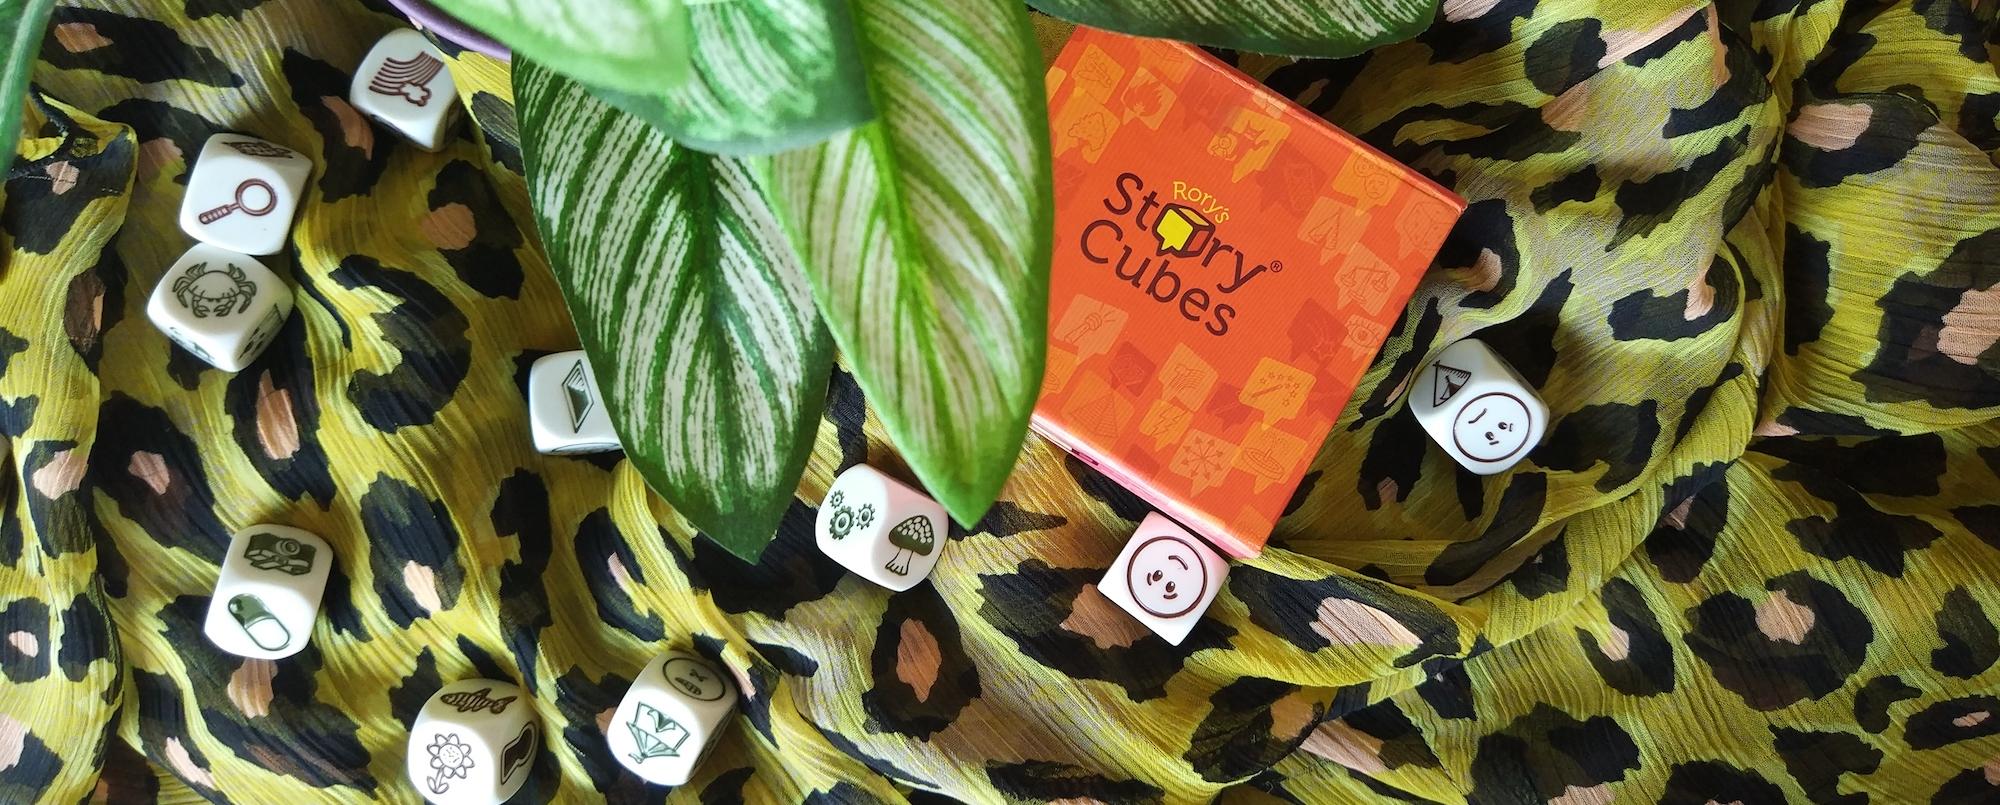 story_cubes_inspiracje